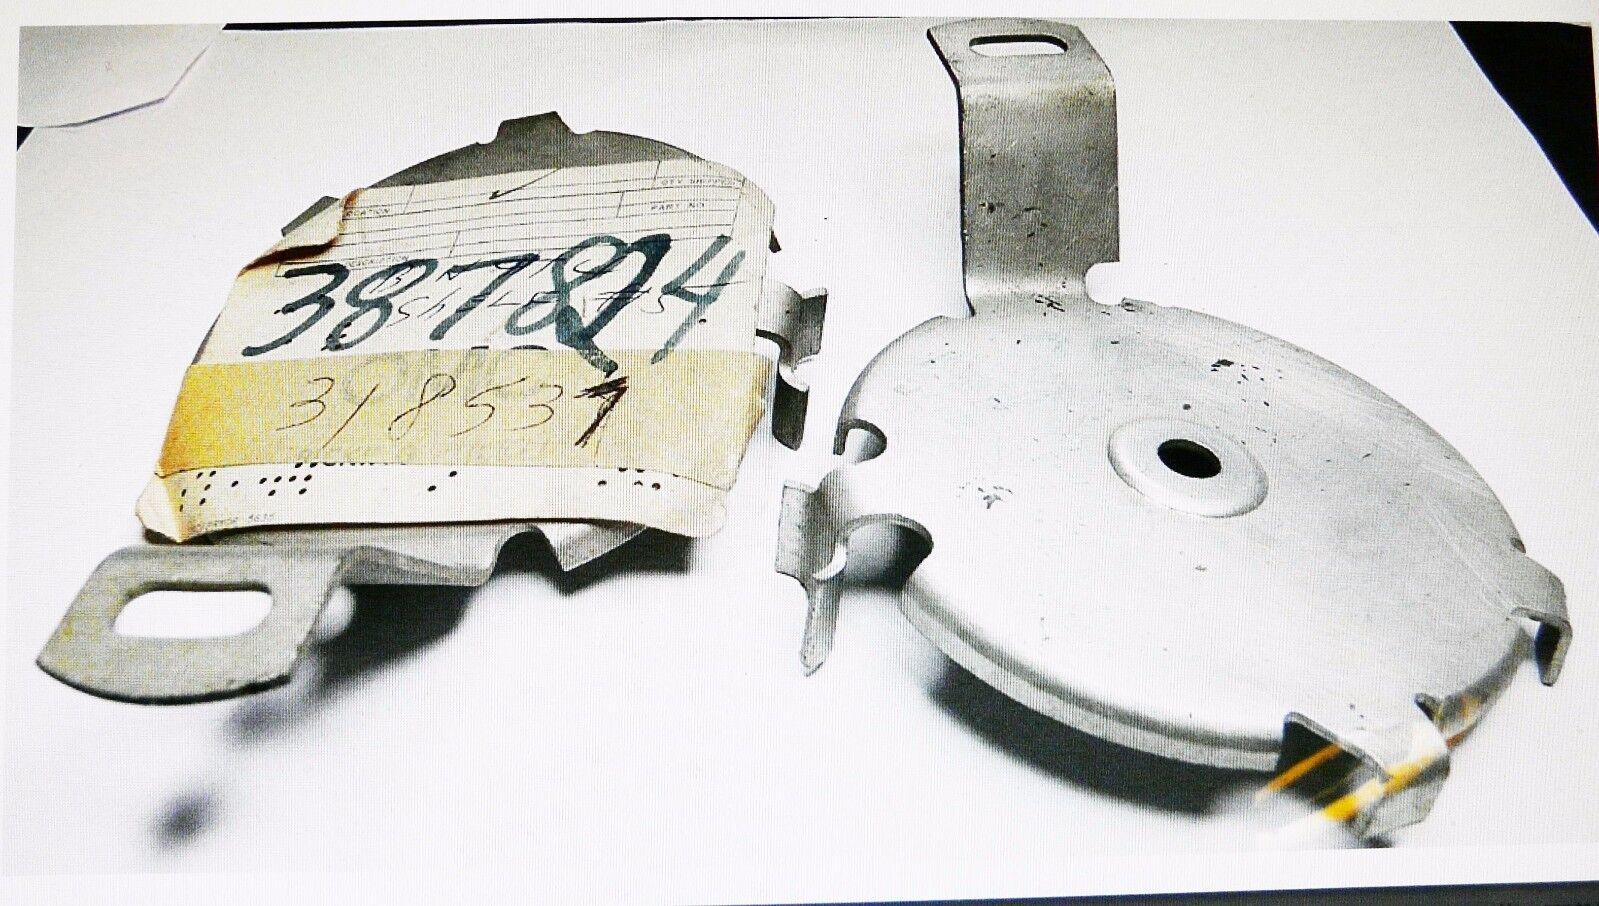 NEW OEM OMC Johnson & Evinrude Plate 387824 NOS  k